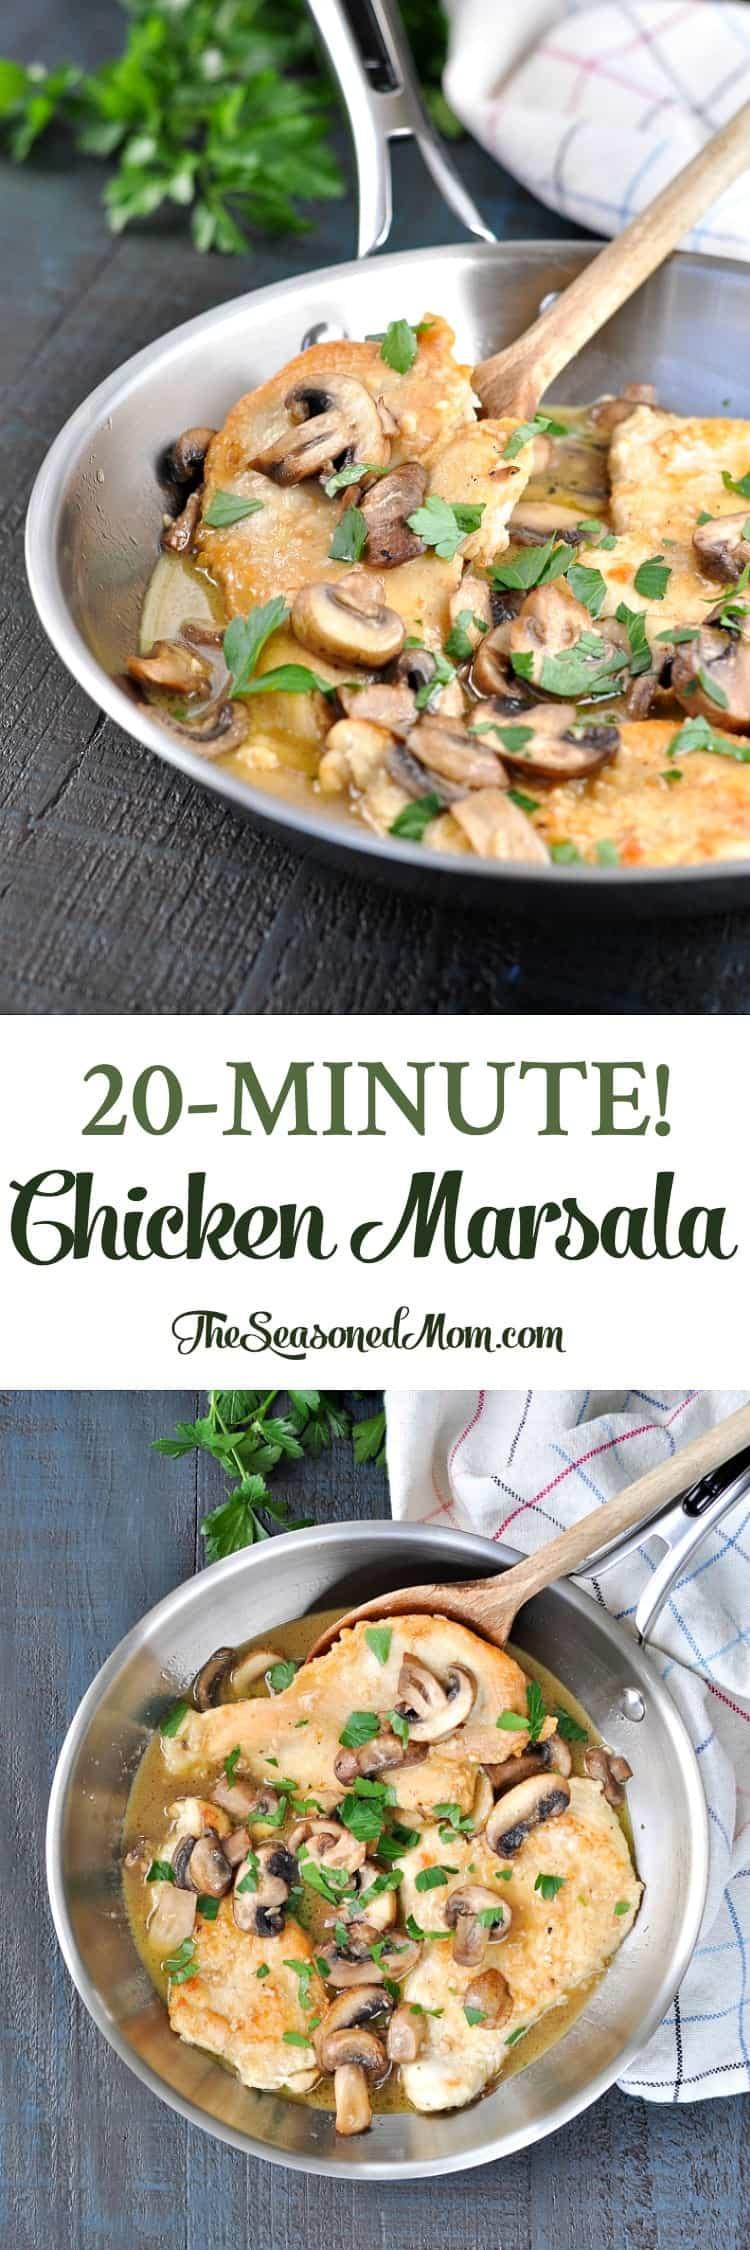 One Skillet 20-Minute Chicken Marsala! Easy Dinner Recipes   Dinner Ideas   Chicken Recipes   Chicken Breast Recipes   Dinner Recipes Easy